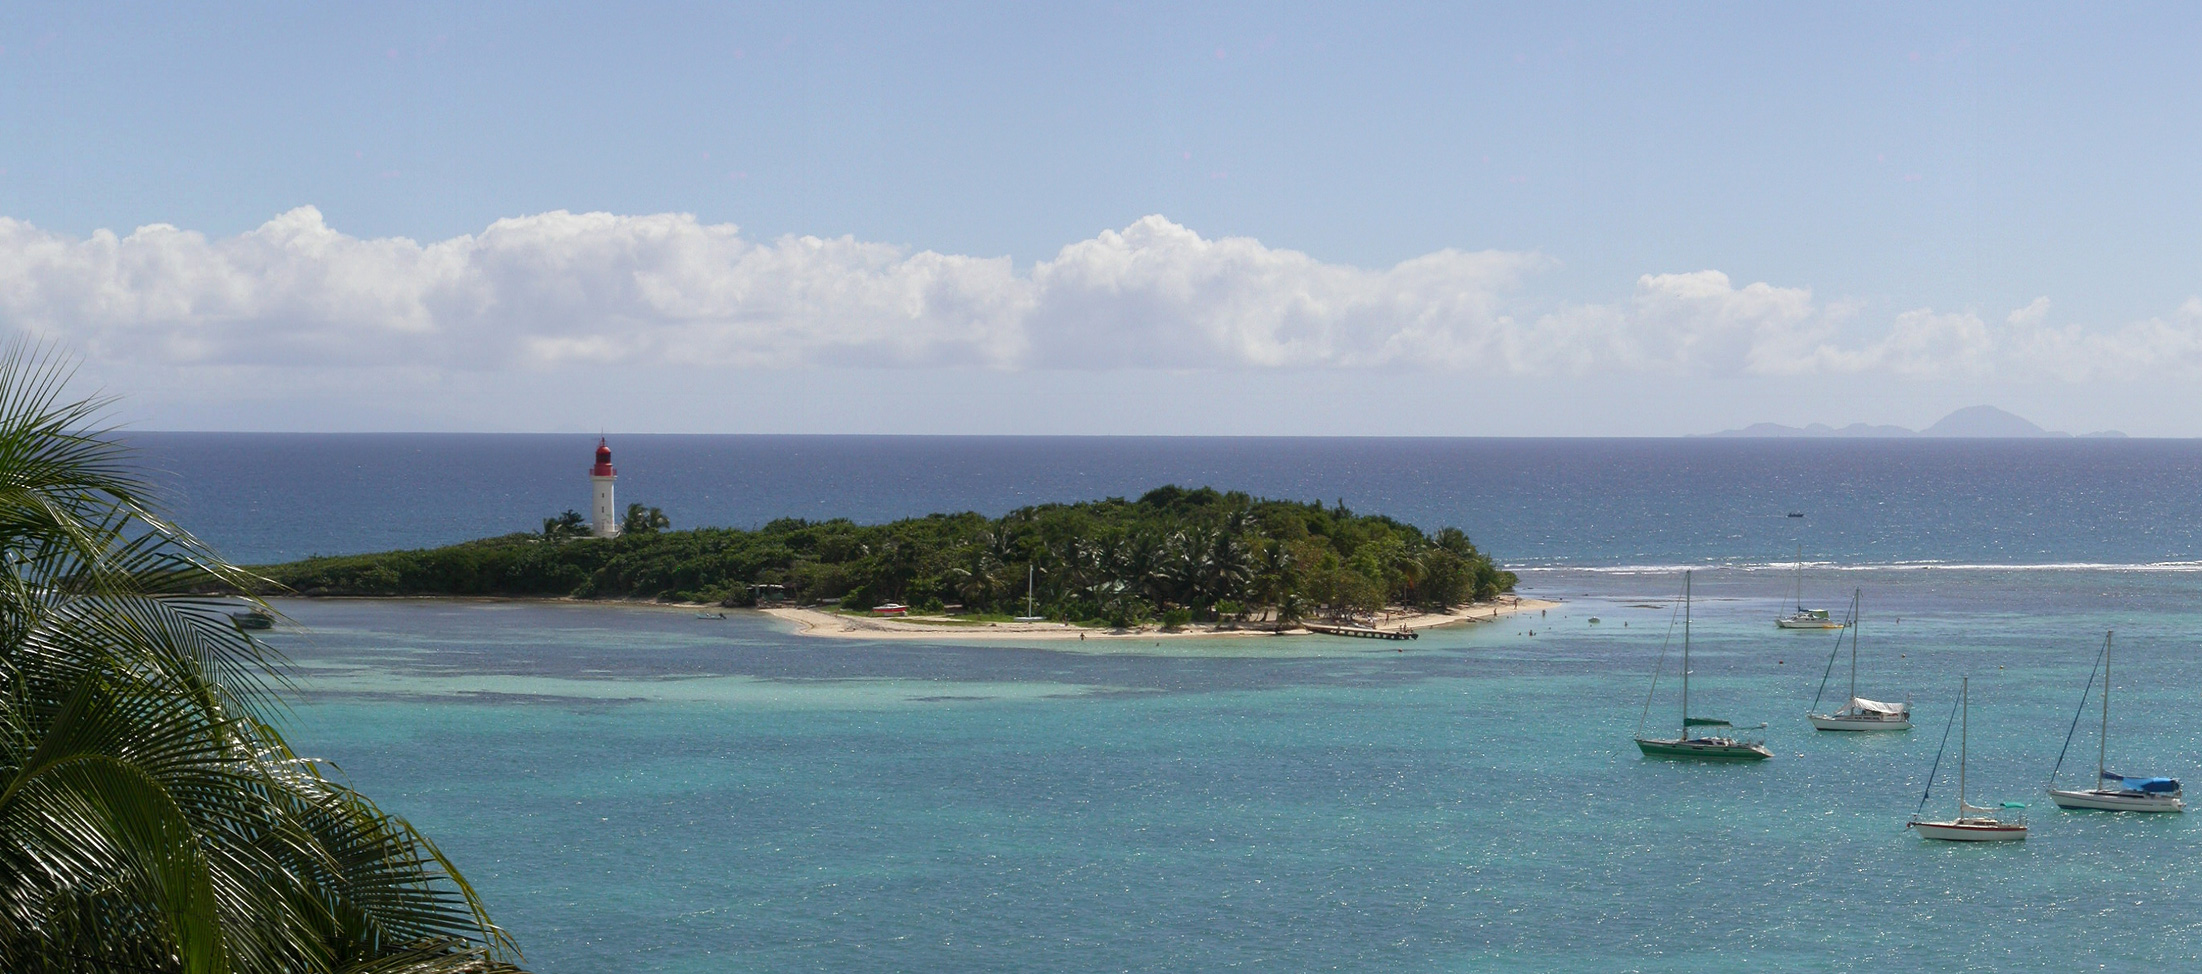 Résidence Turquoise Guadeloupe vue mer sea view et vue lagon laggon view